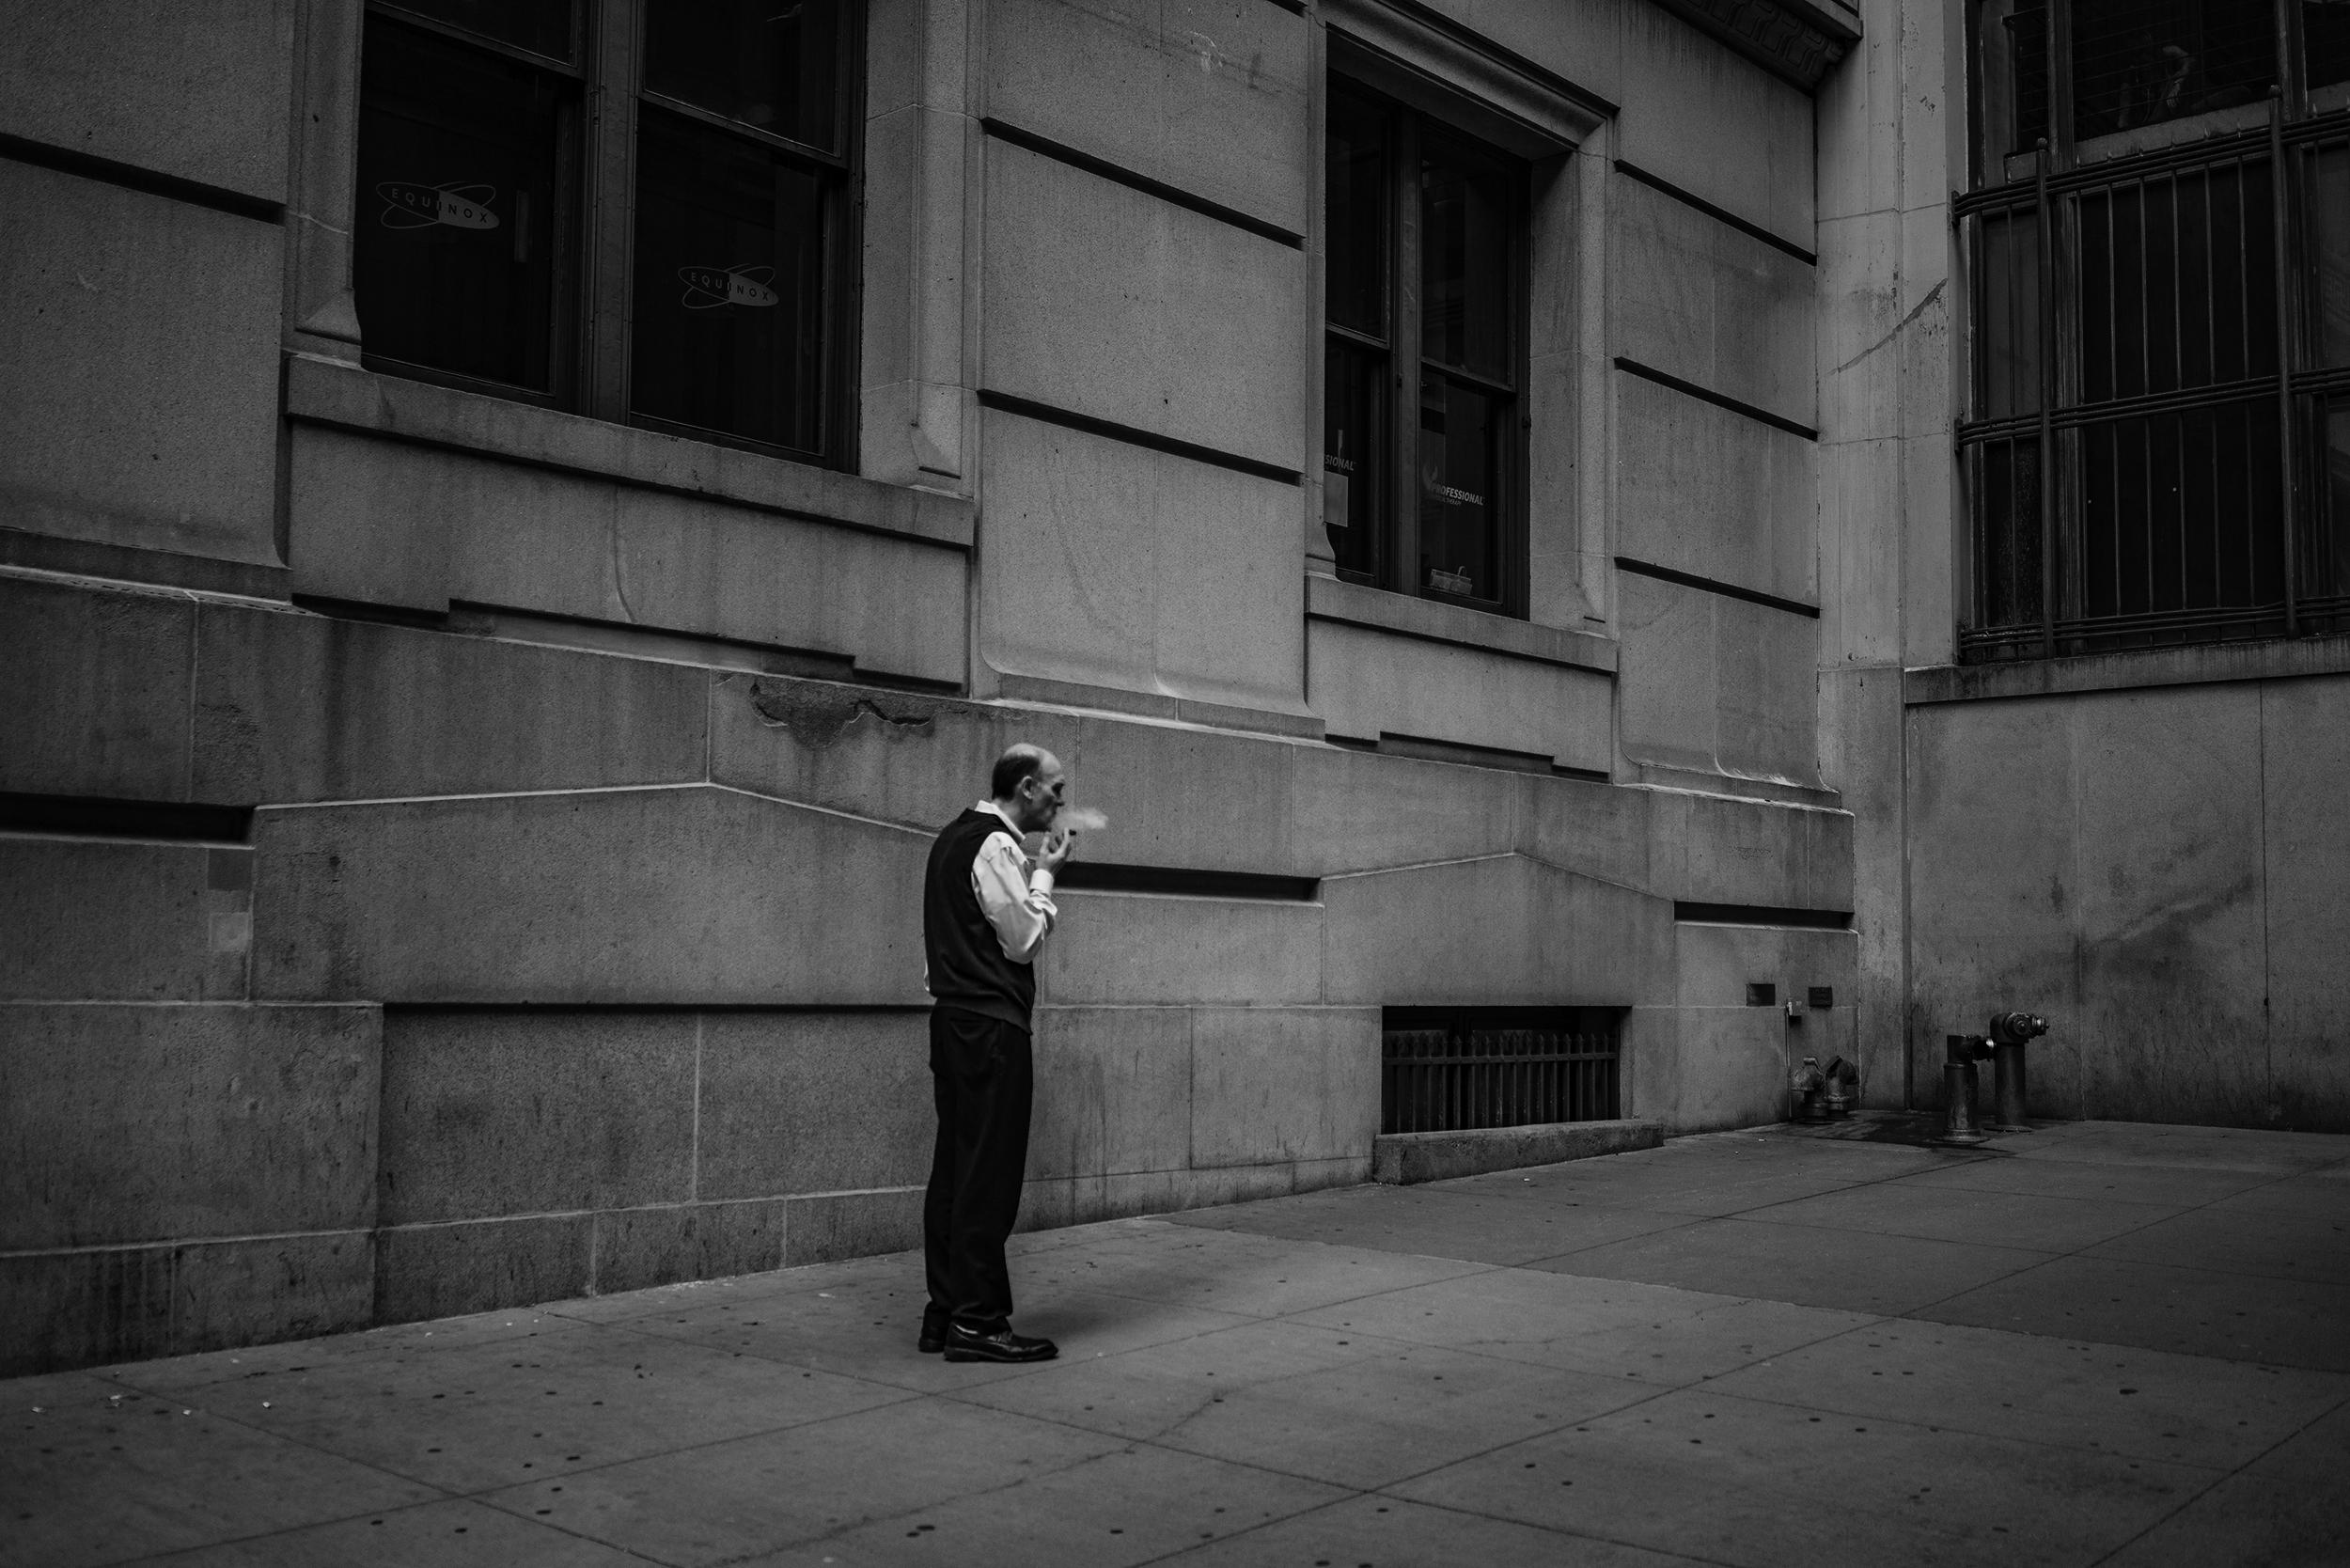 NYC_Street_2019_Wall_Street_Cigar_Smoker-031.jpg